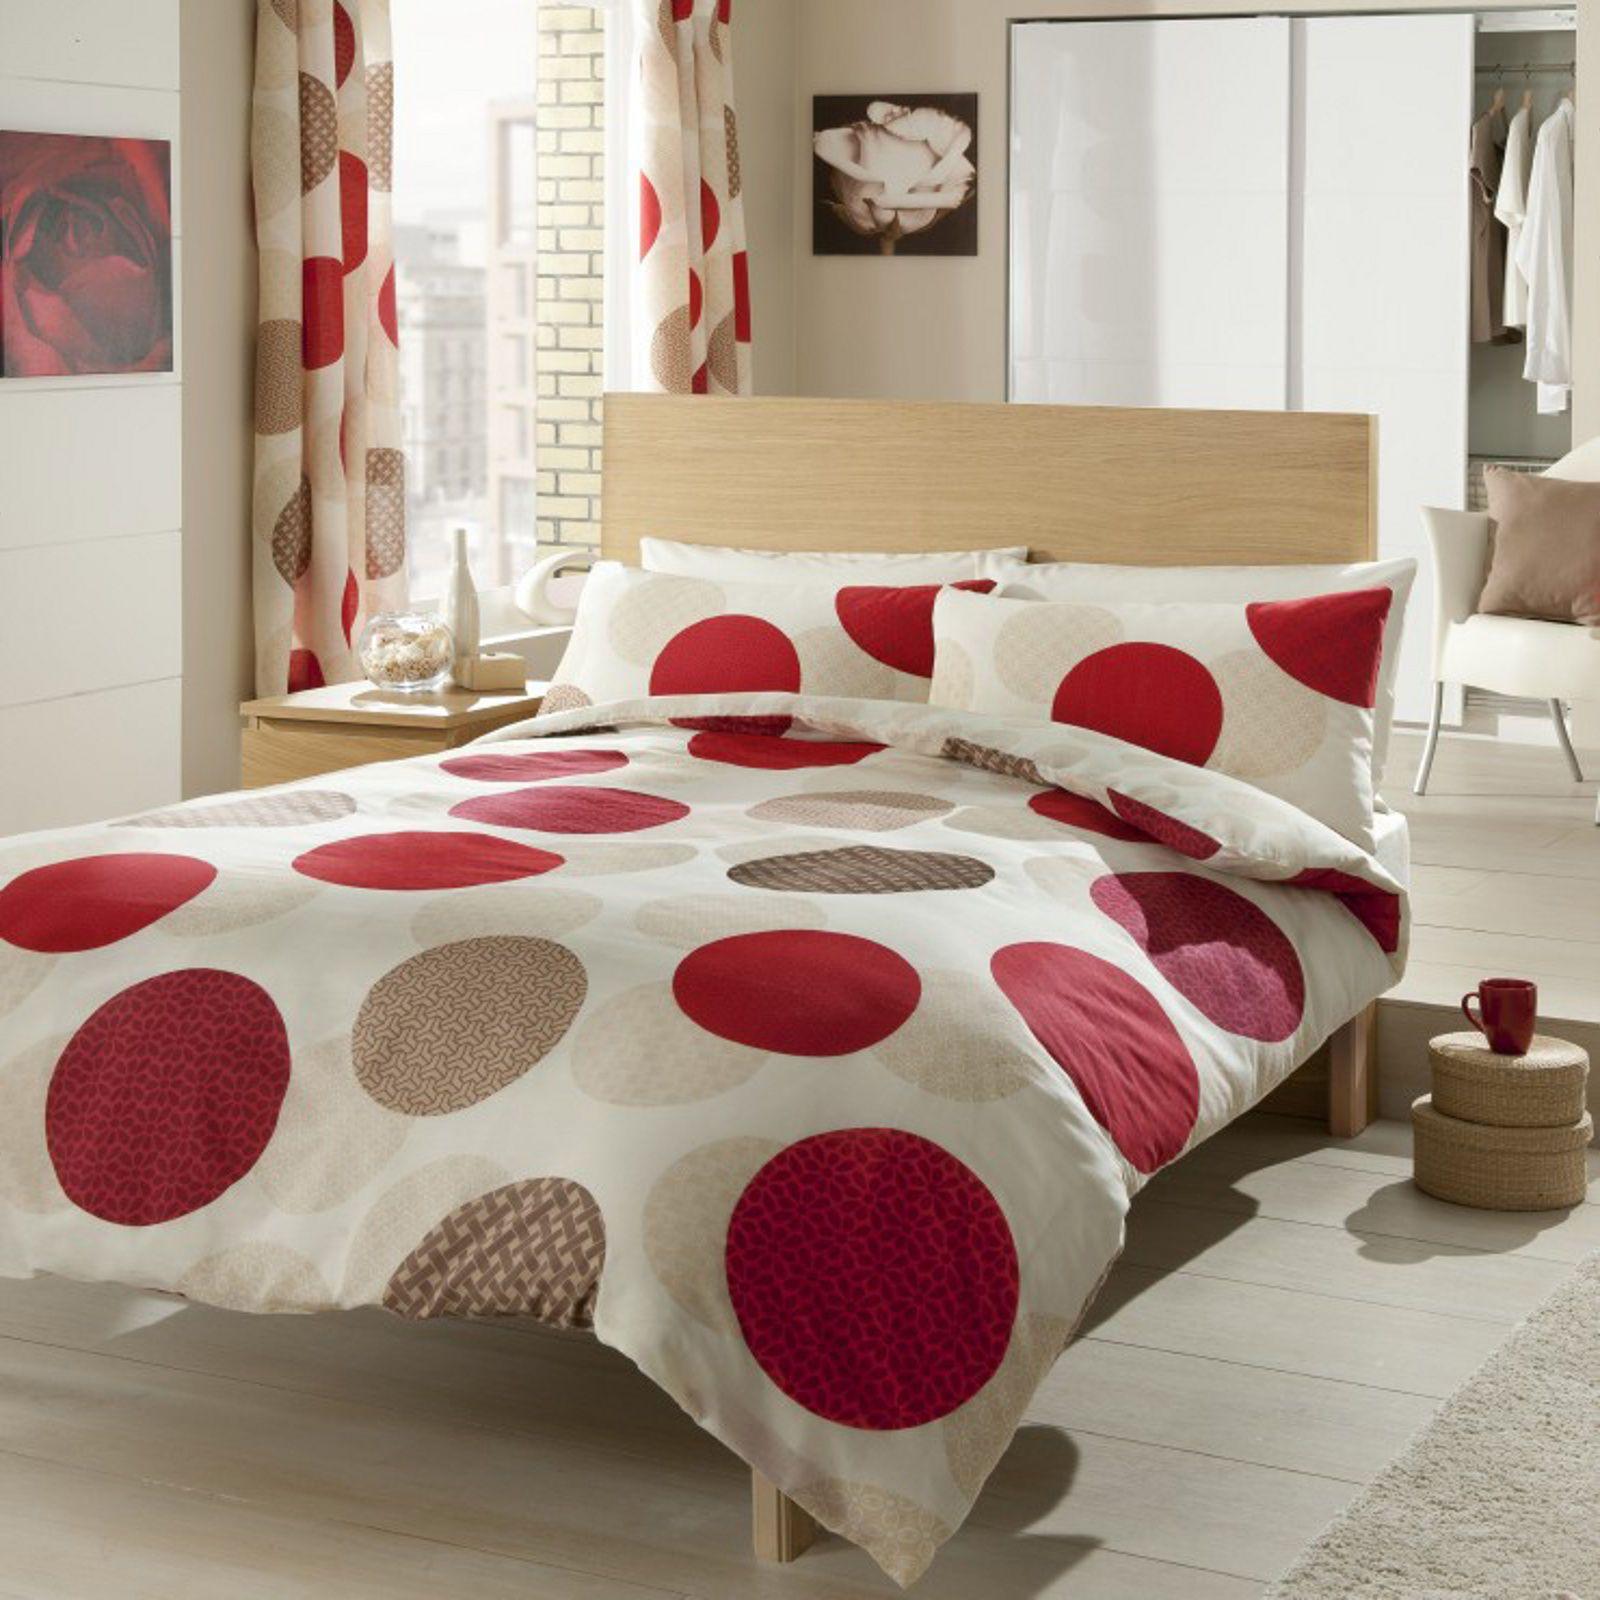 Funda edred n colcha funda almohada juego ropa cama individual doble king ebay comprar - Fundas para cama ...